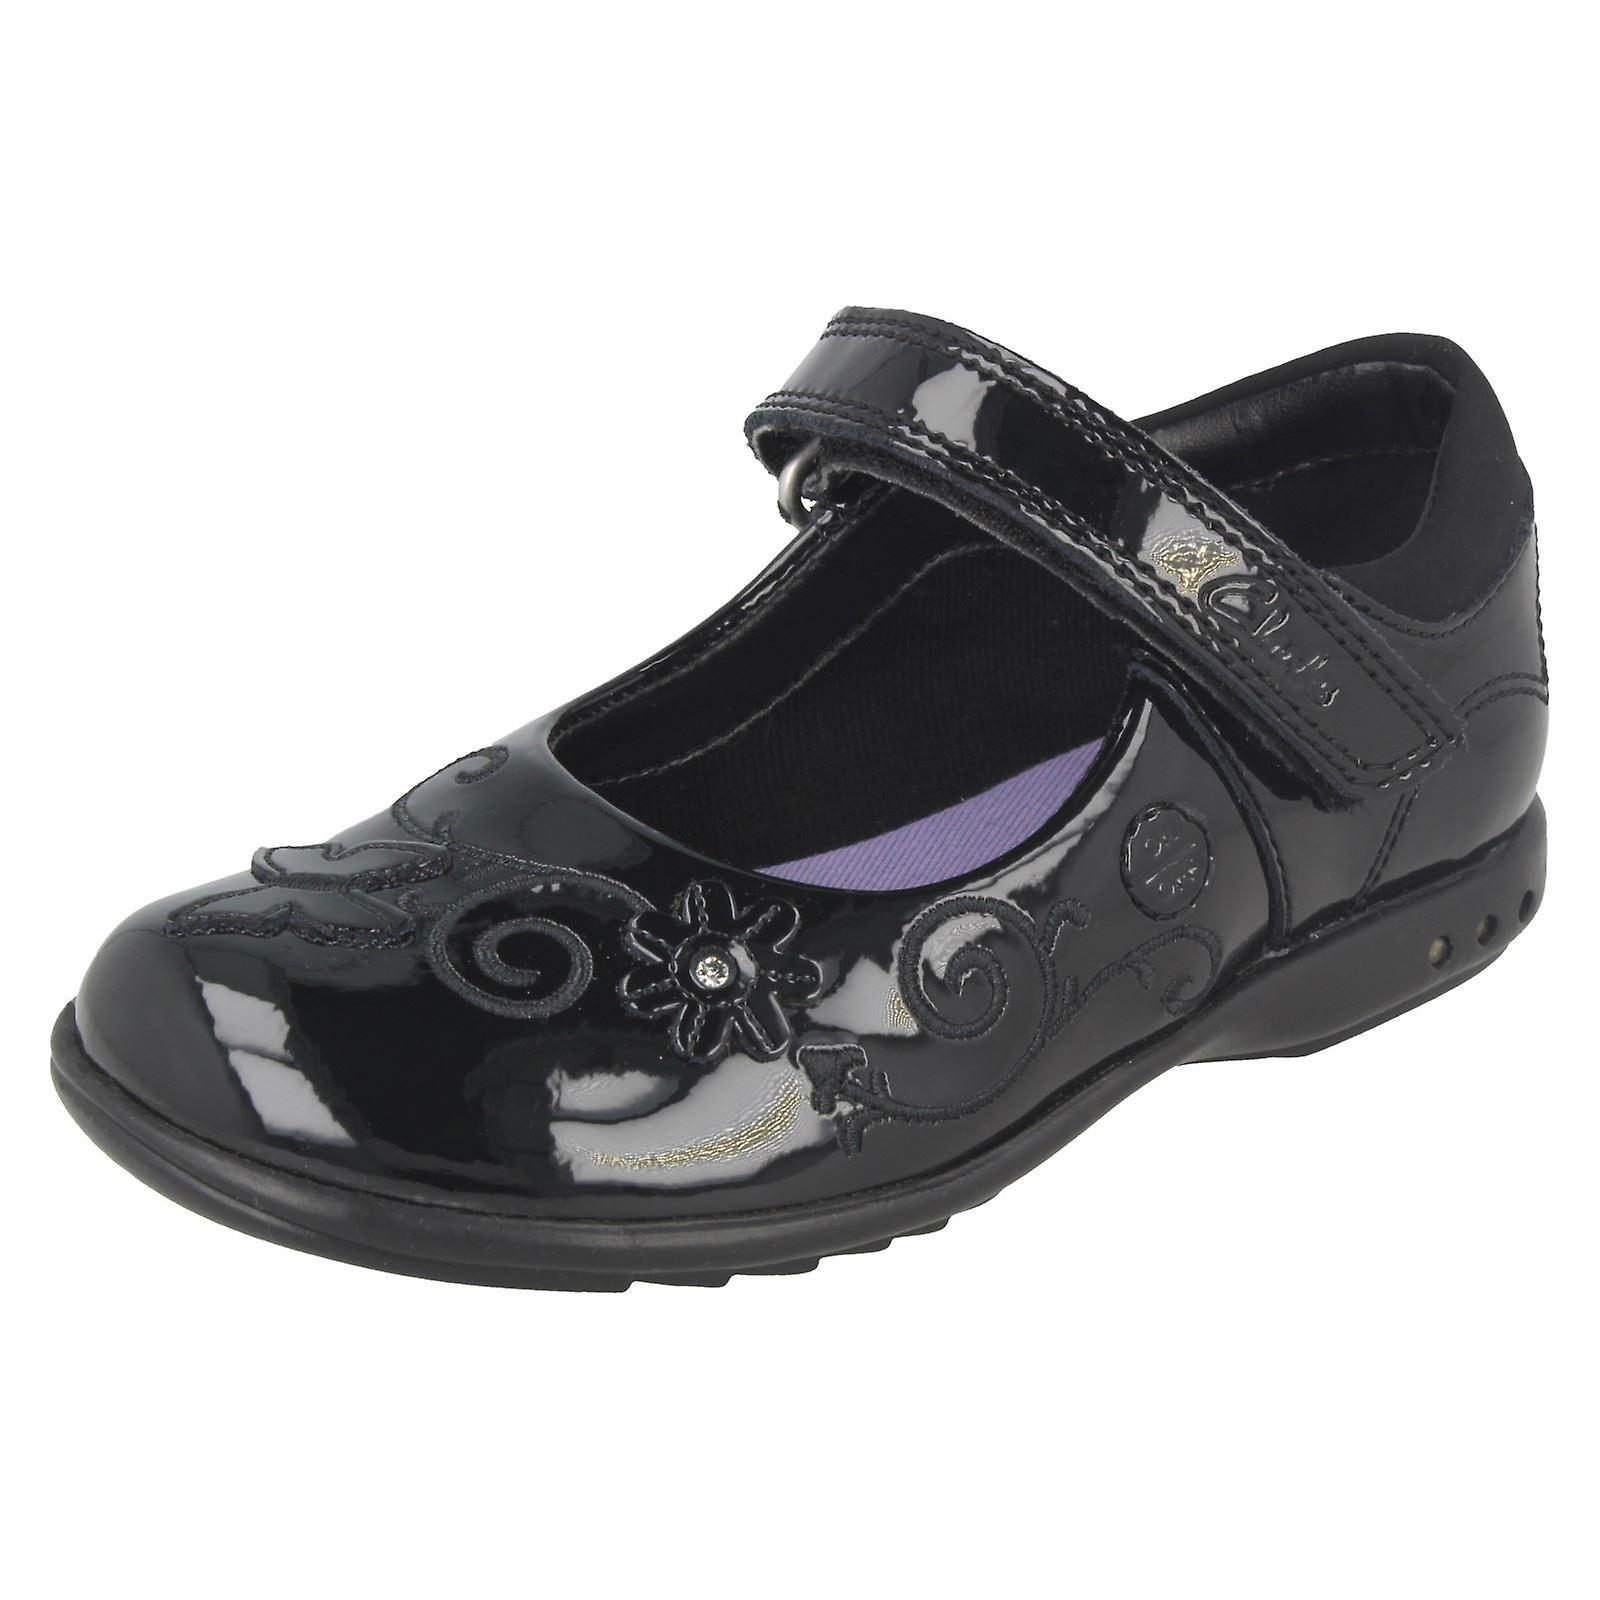 Mädchenschule Clarks Schuhe Liebe Breena